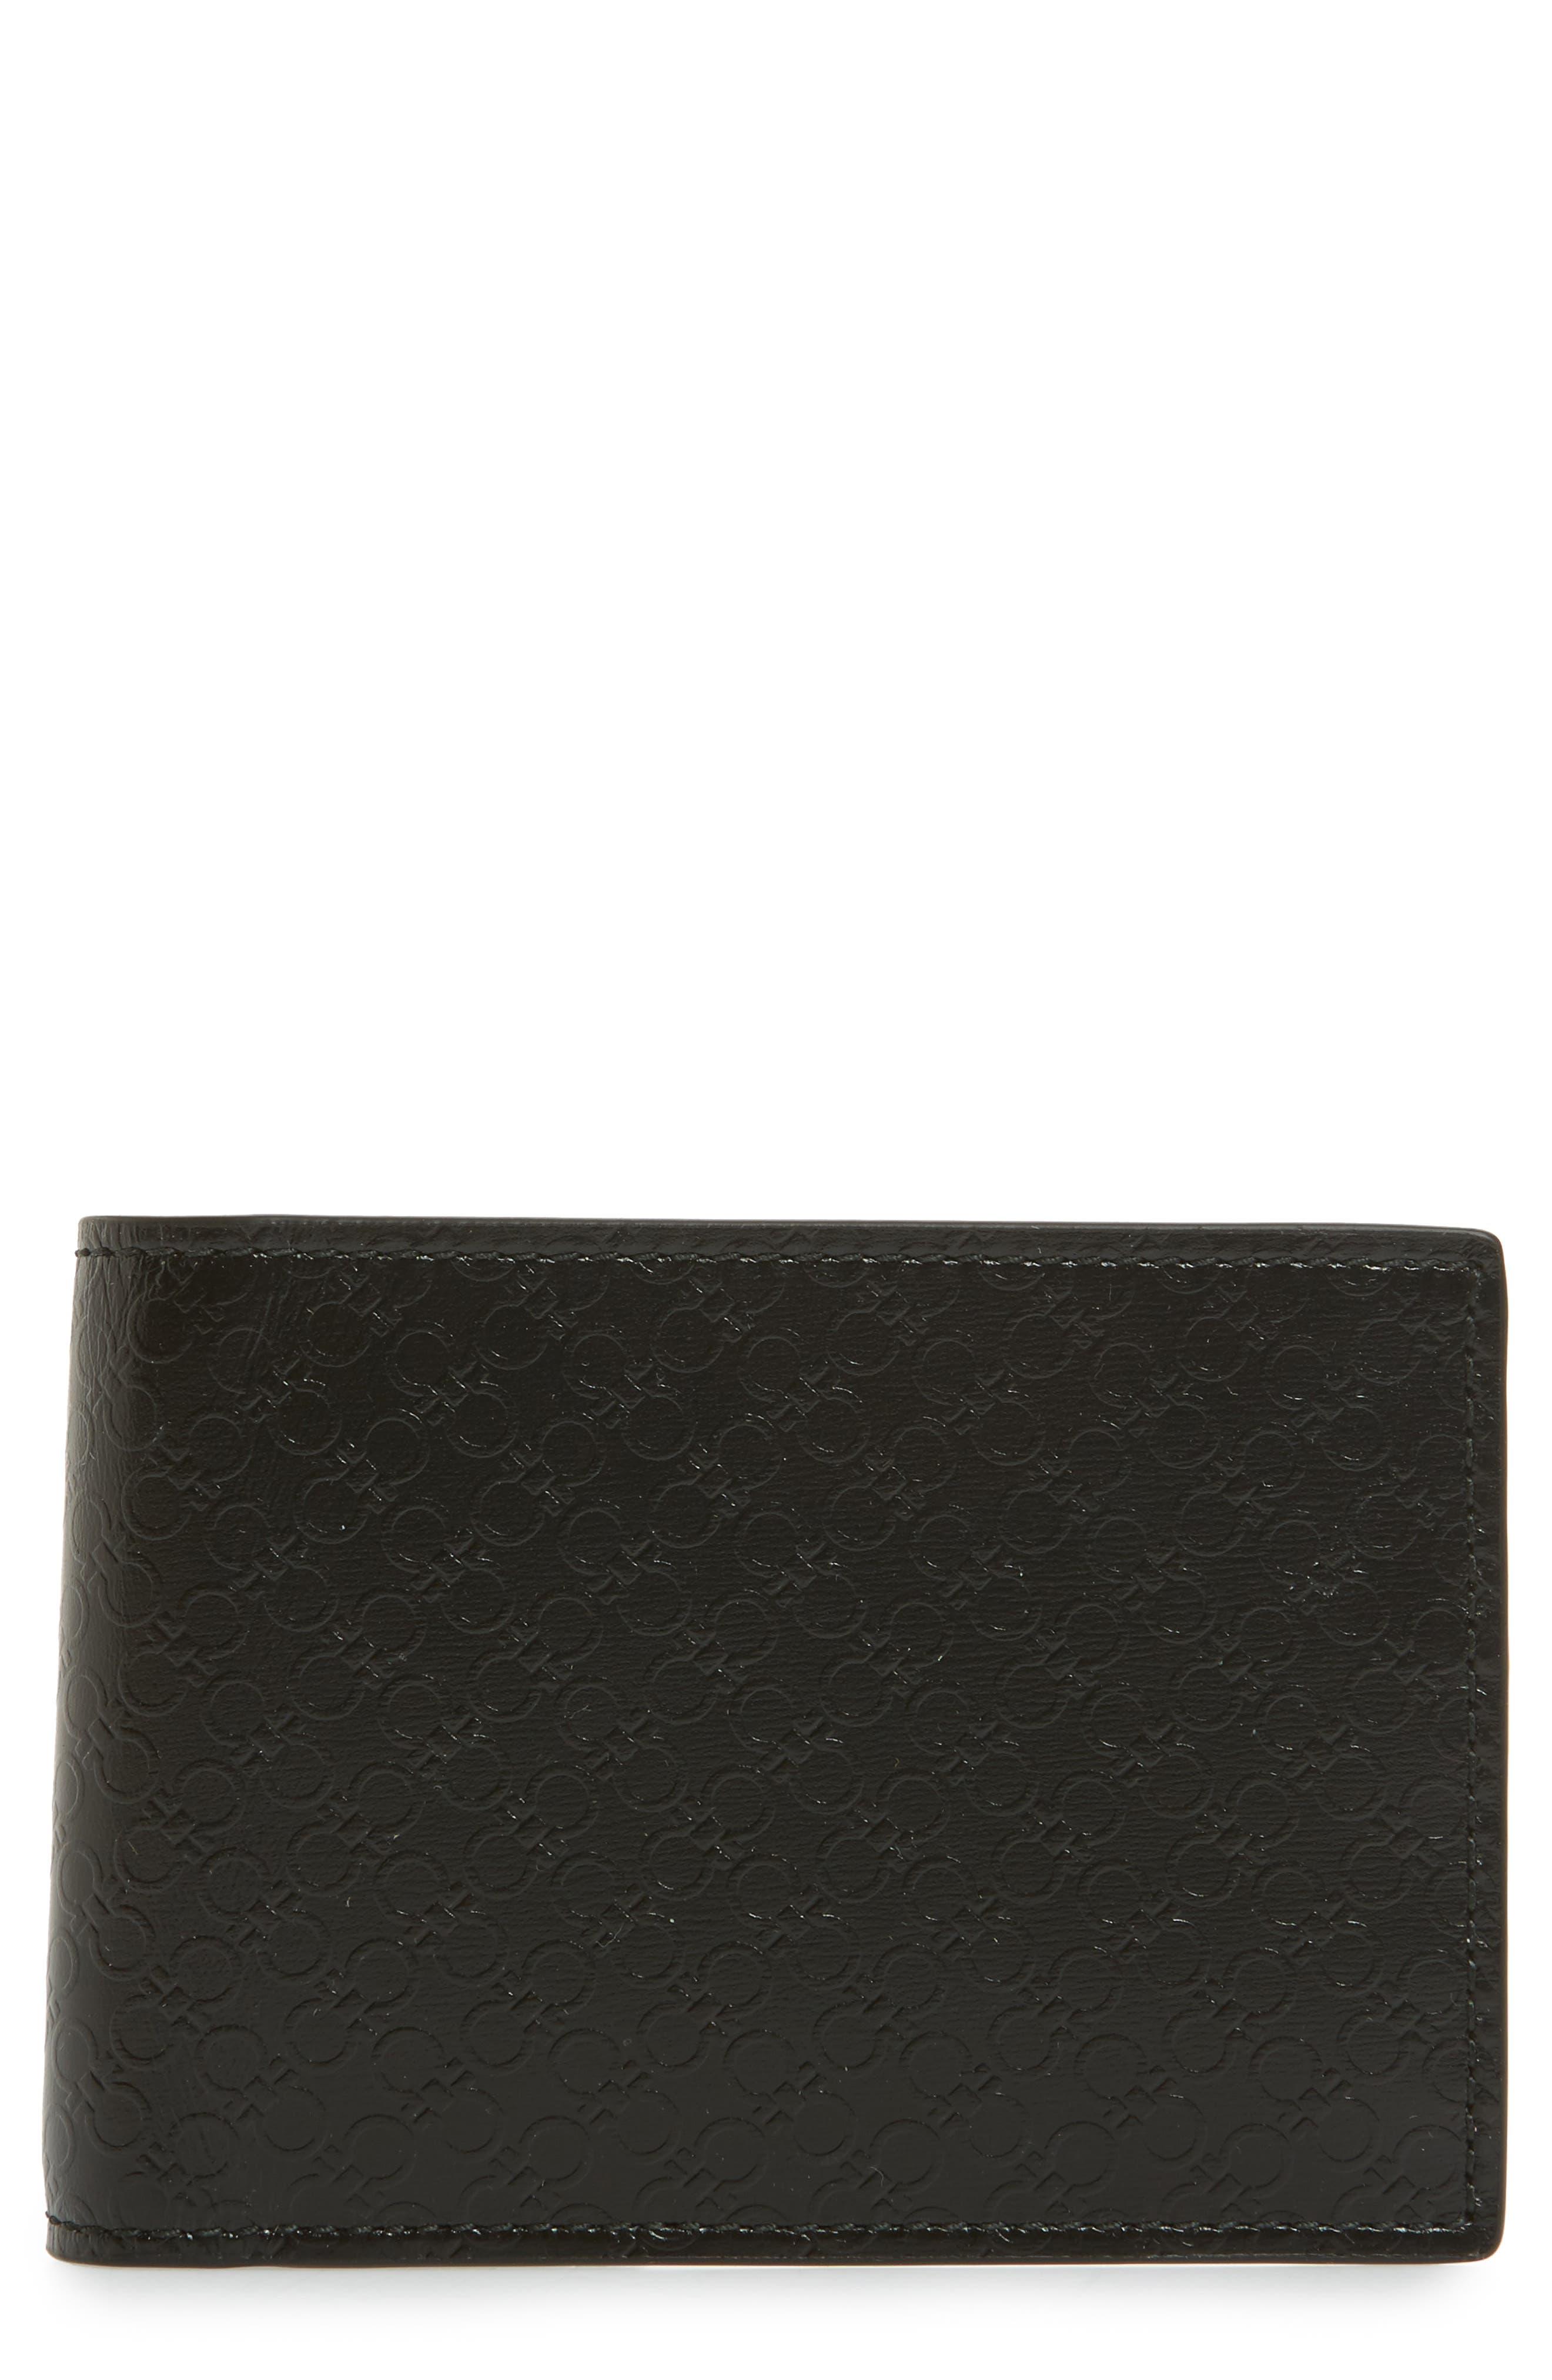 Alternate Image 1 Selected - Salvatore Ferragamo Gancini Leather Card Case